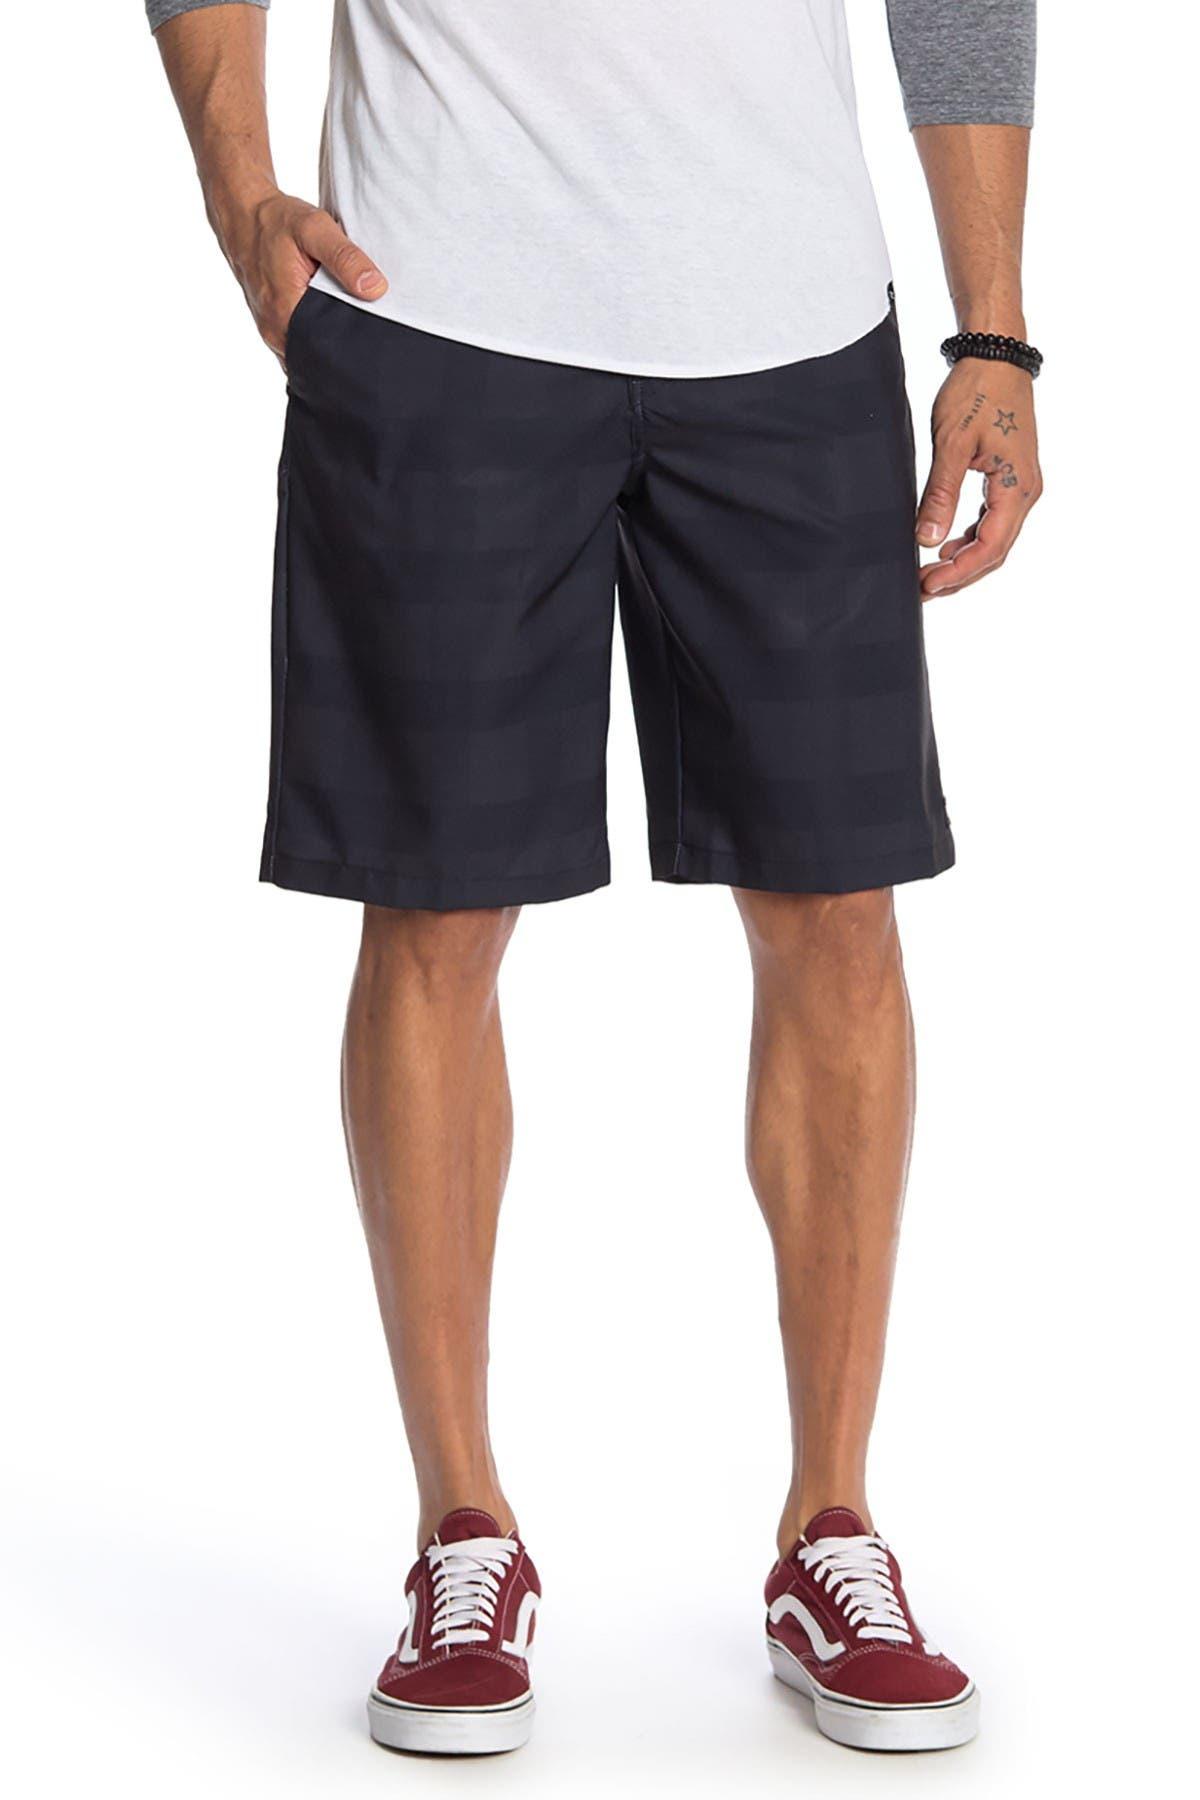 Image of Rip Curl Boardwalk Shorts